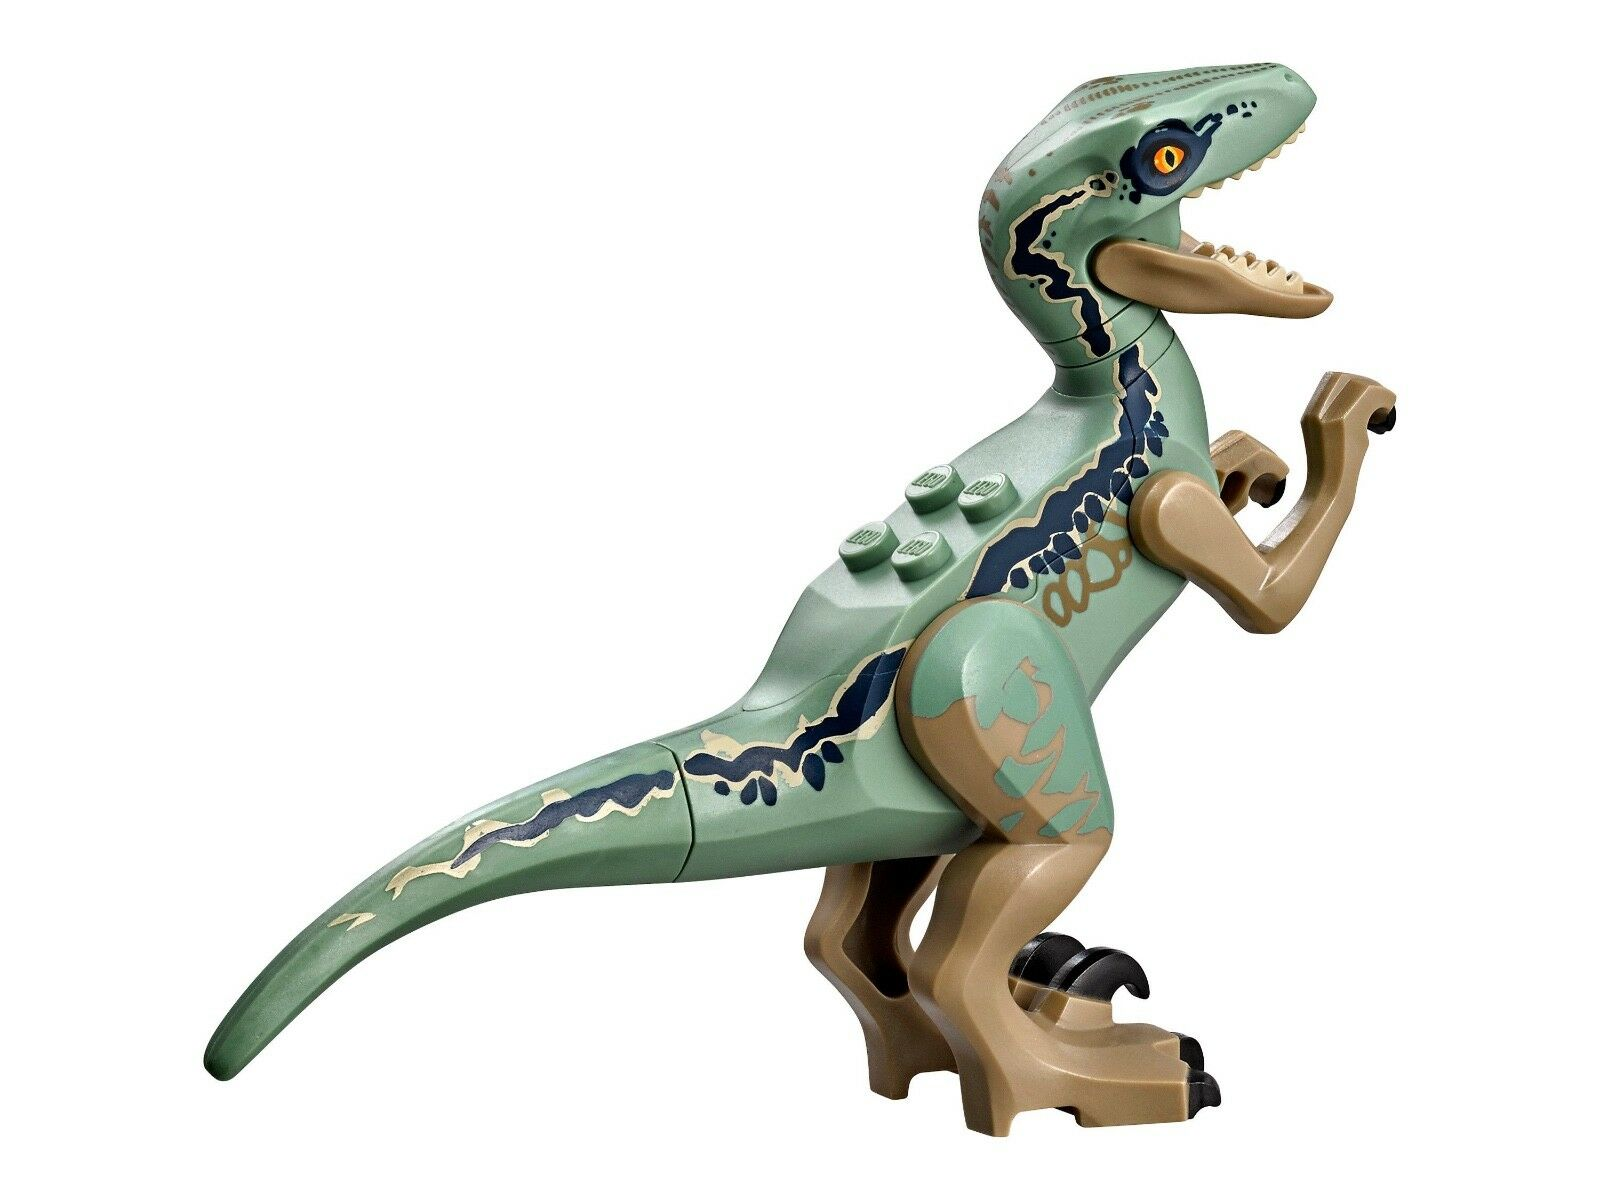 Lego Jurassic World Blue Raptor 75930 Rampage 75928 Indoraptor